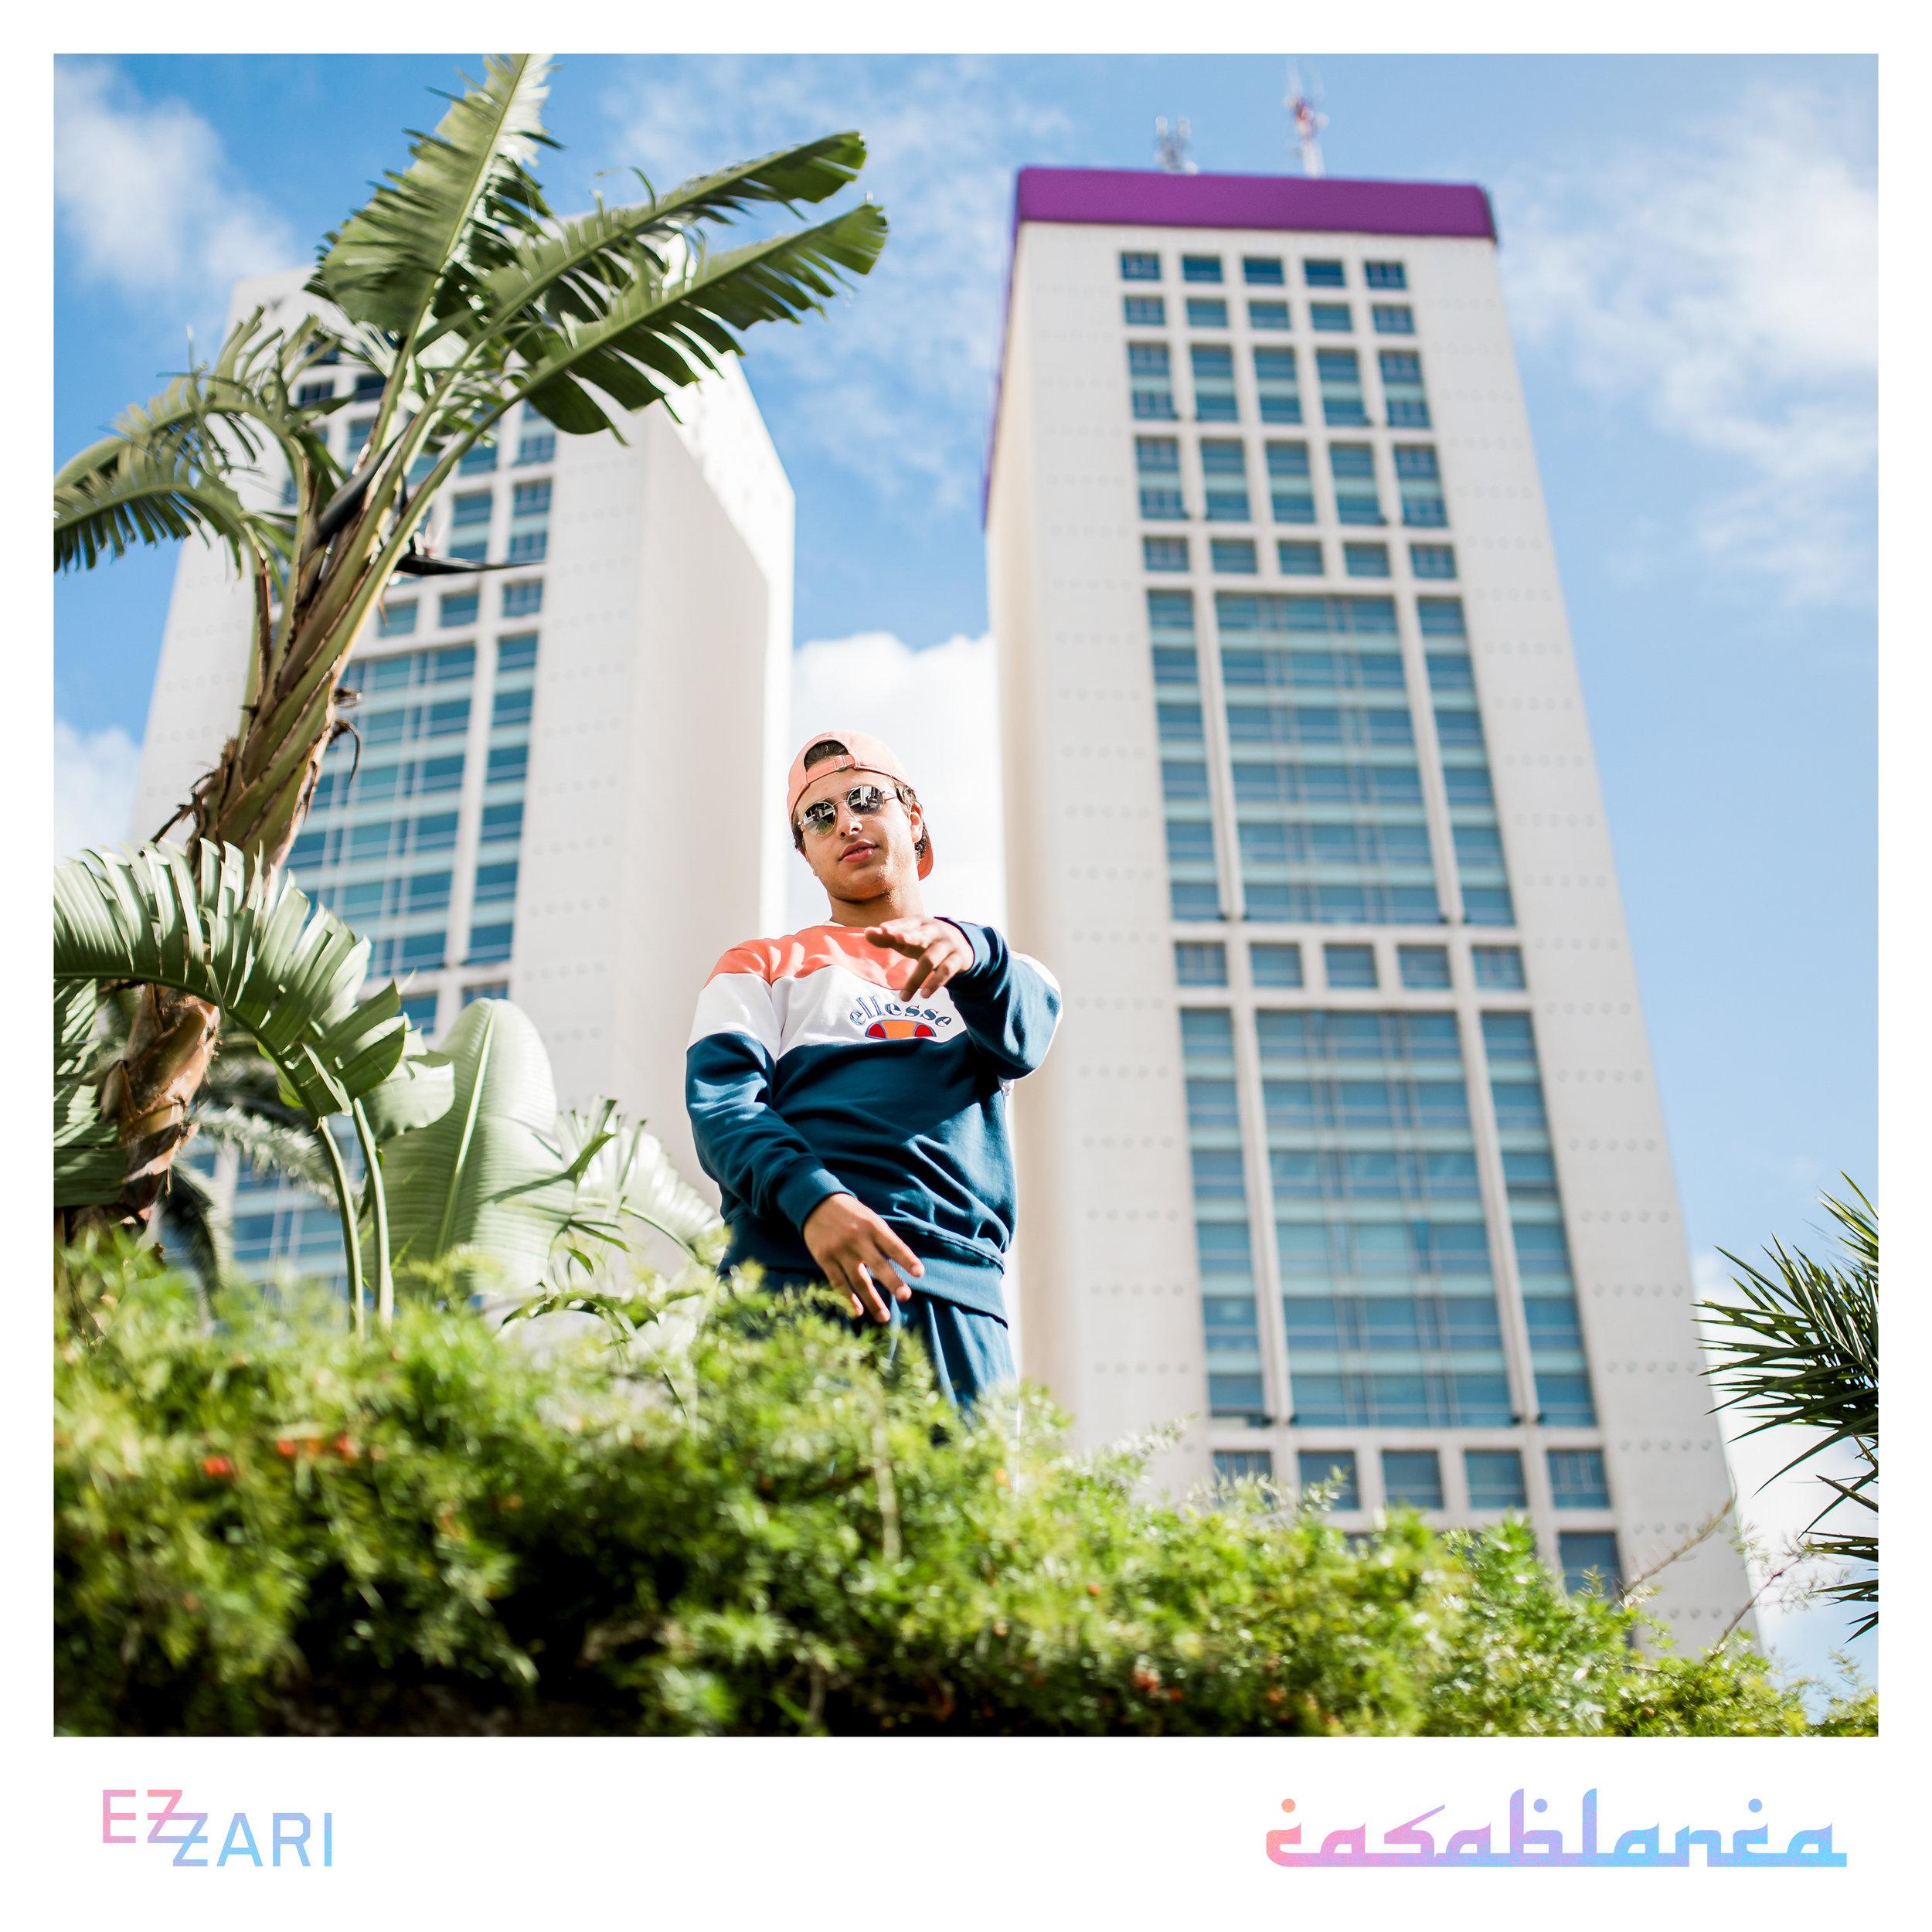 Ezzari-Casablanca-cover.jpg